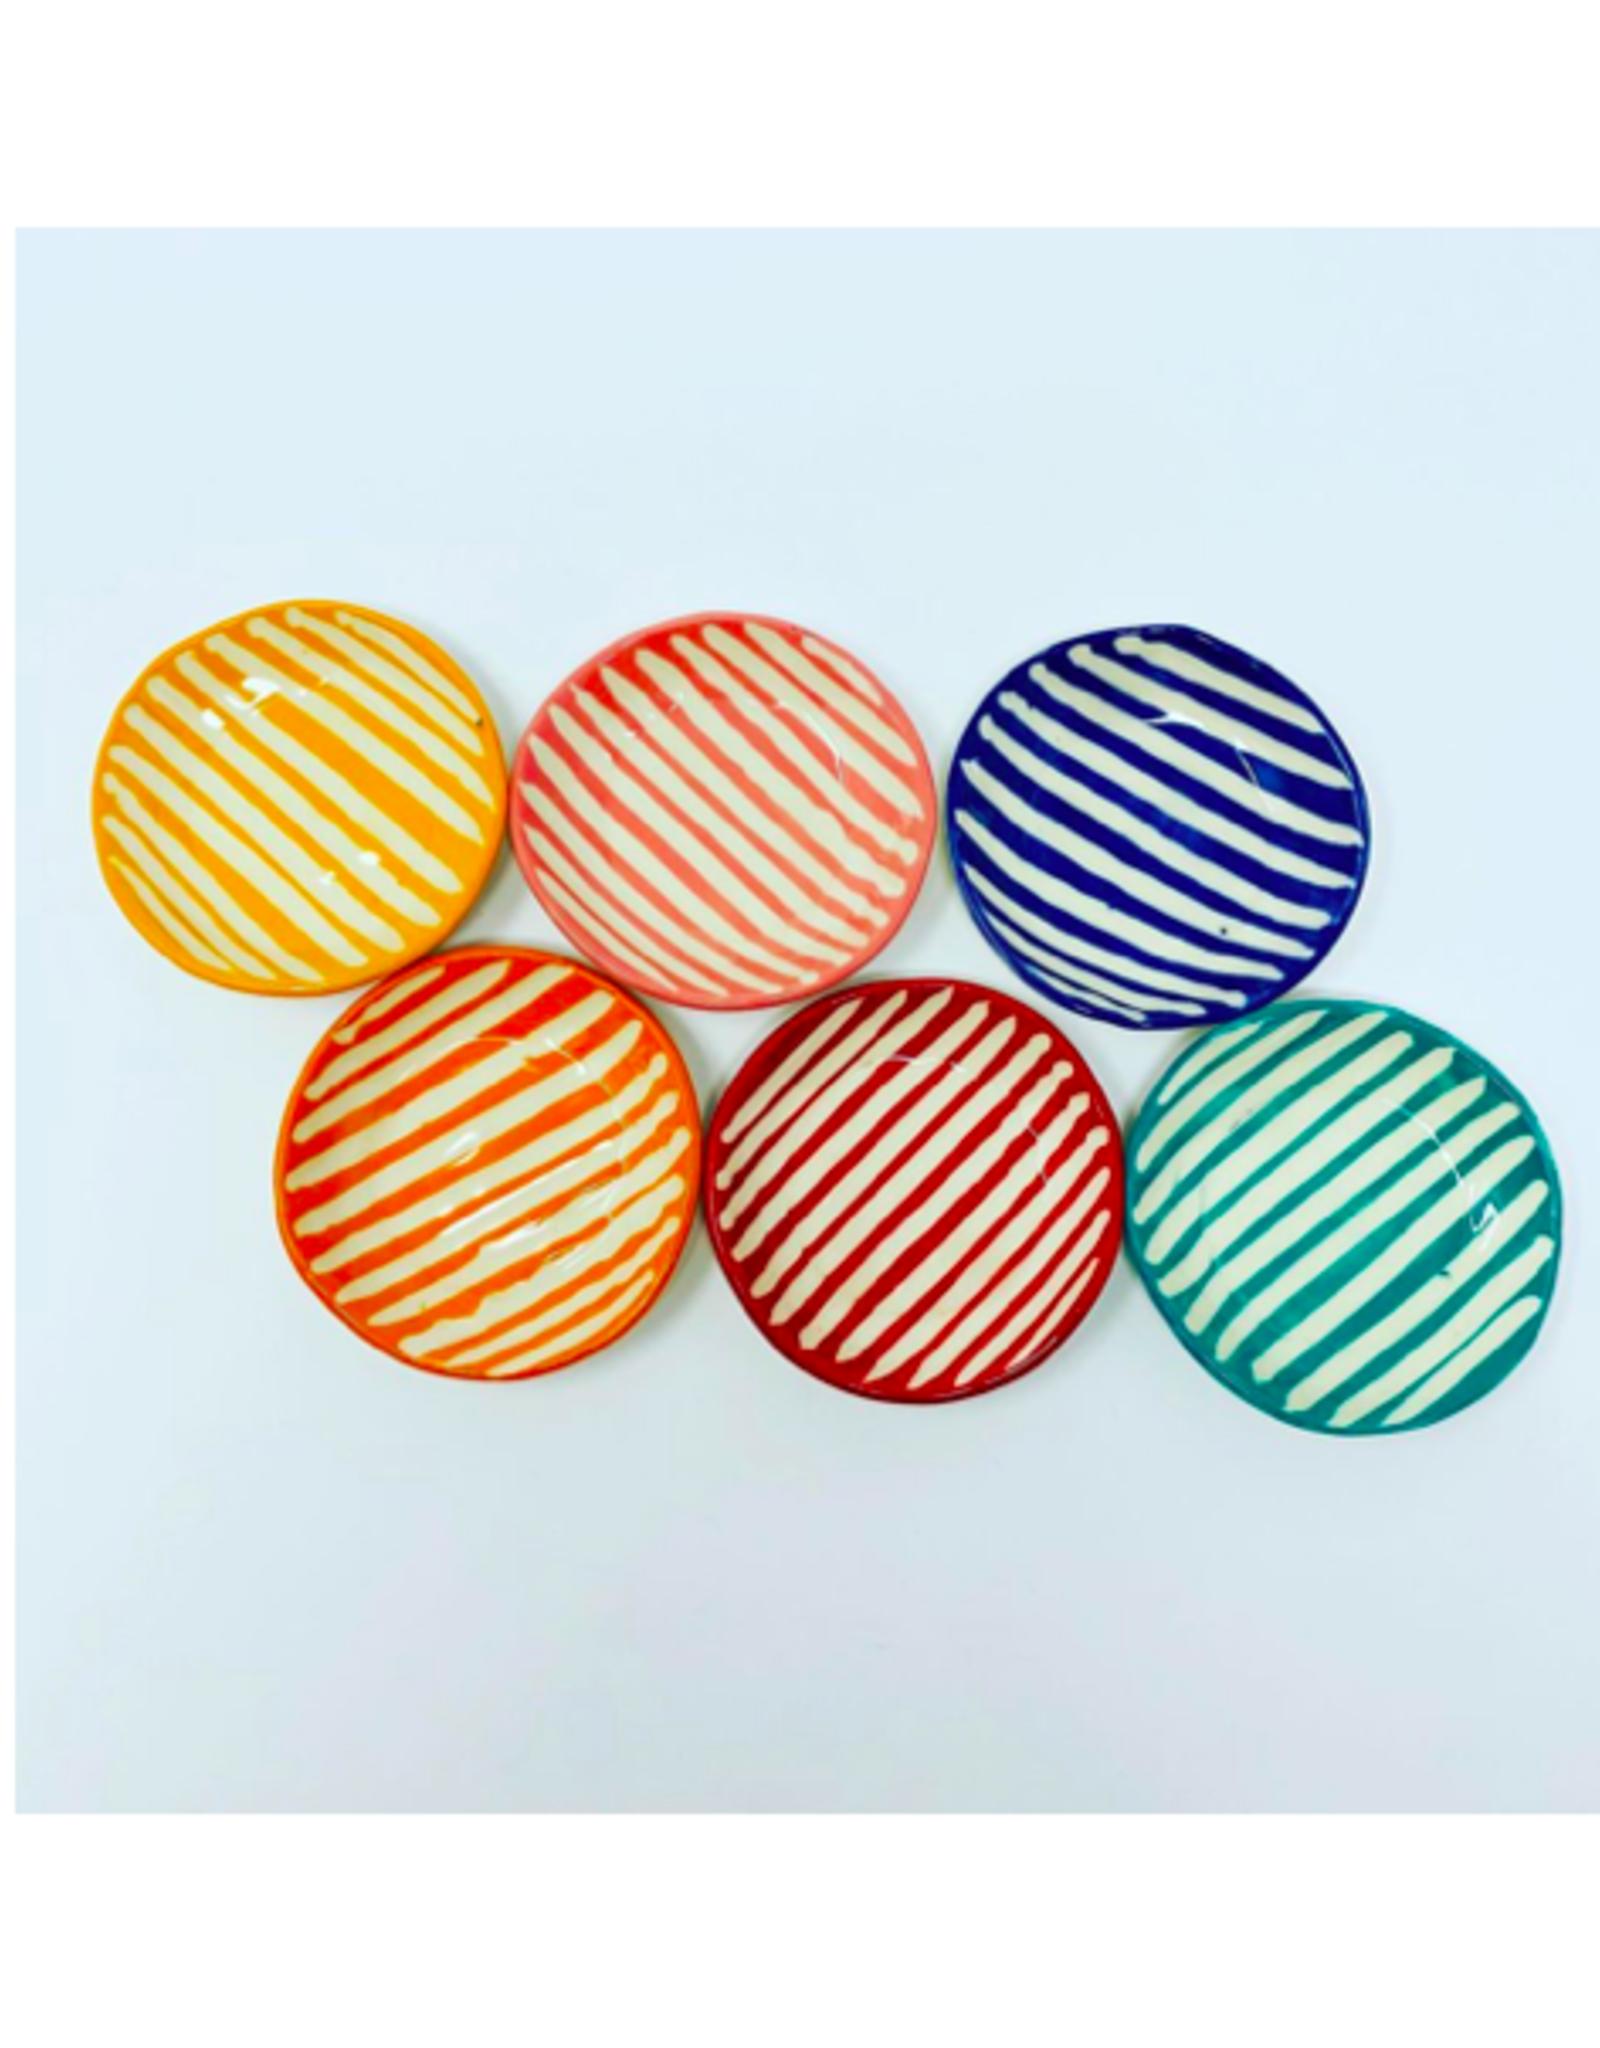 KG Ceramics Studio KG Ceramics - Small Dish/Teal